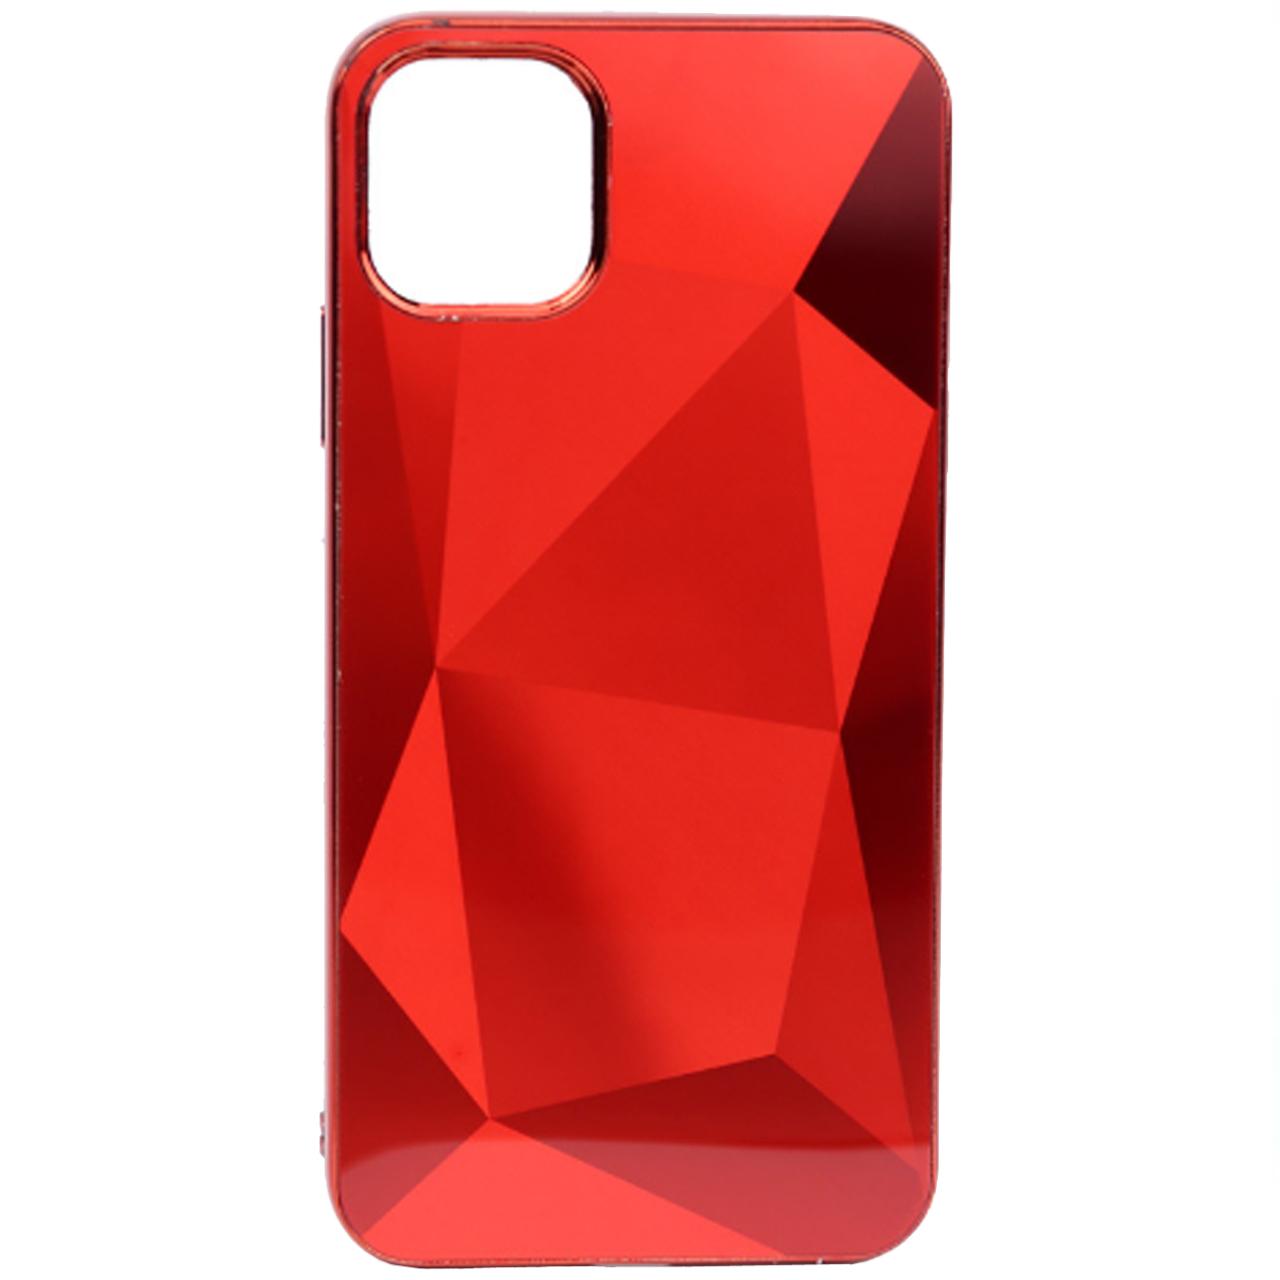 کاور طرح الماس کد 0012 مناسب برای گوشی موبایل اپل iPhone 11 Pro Max